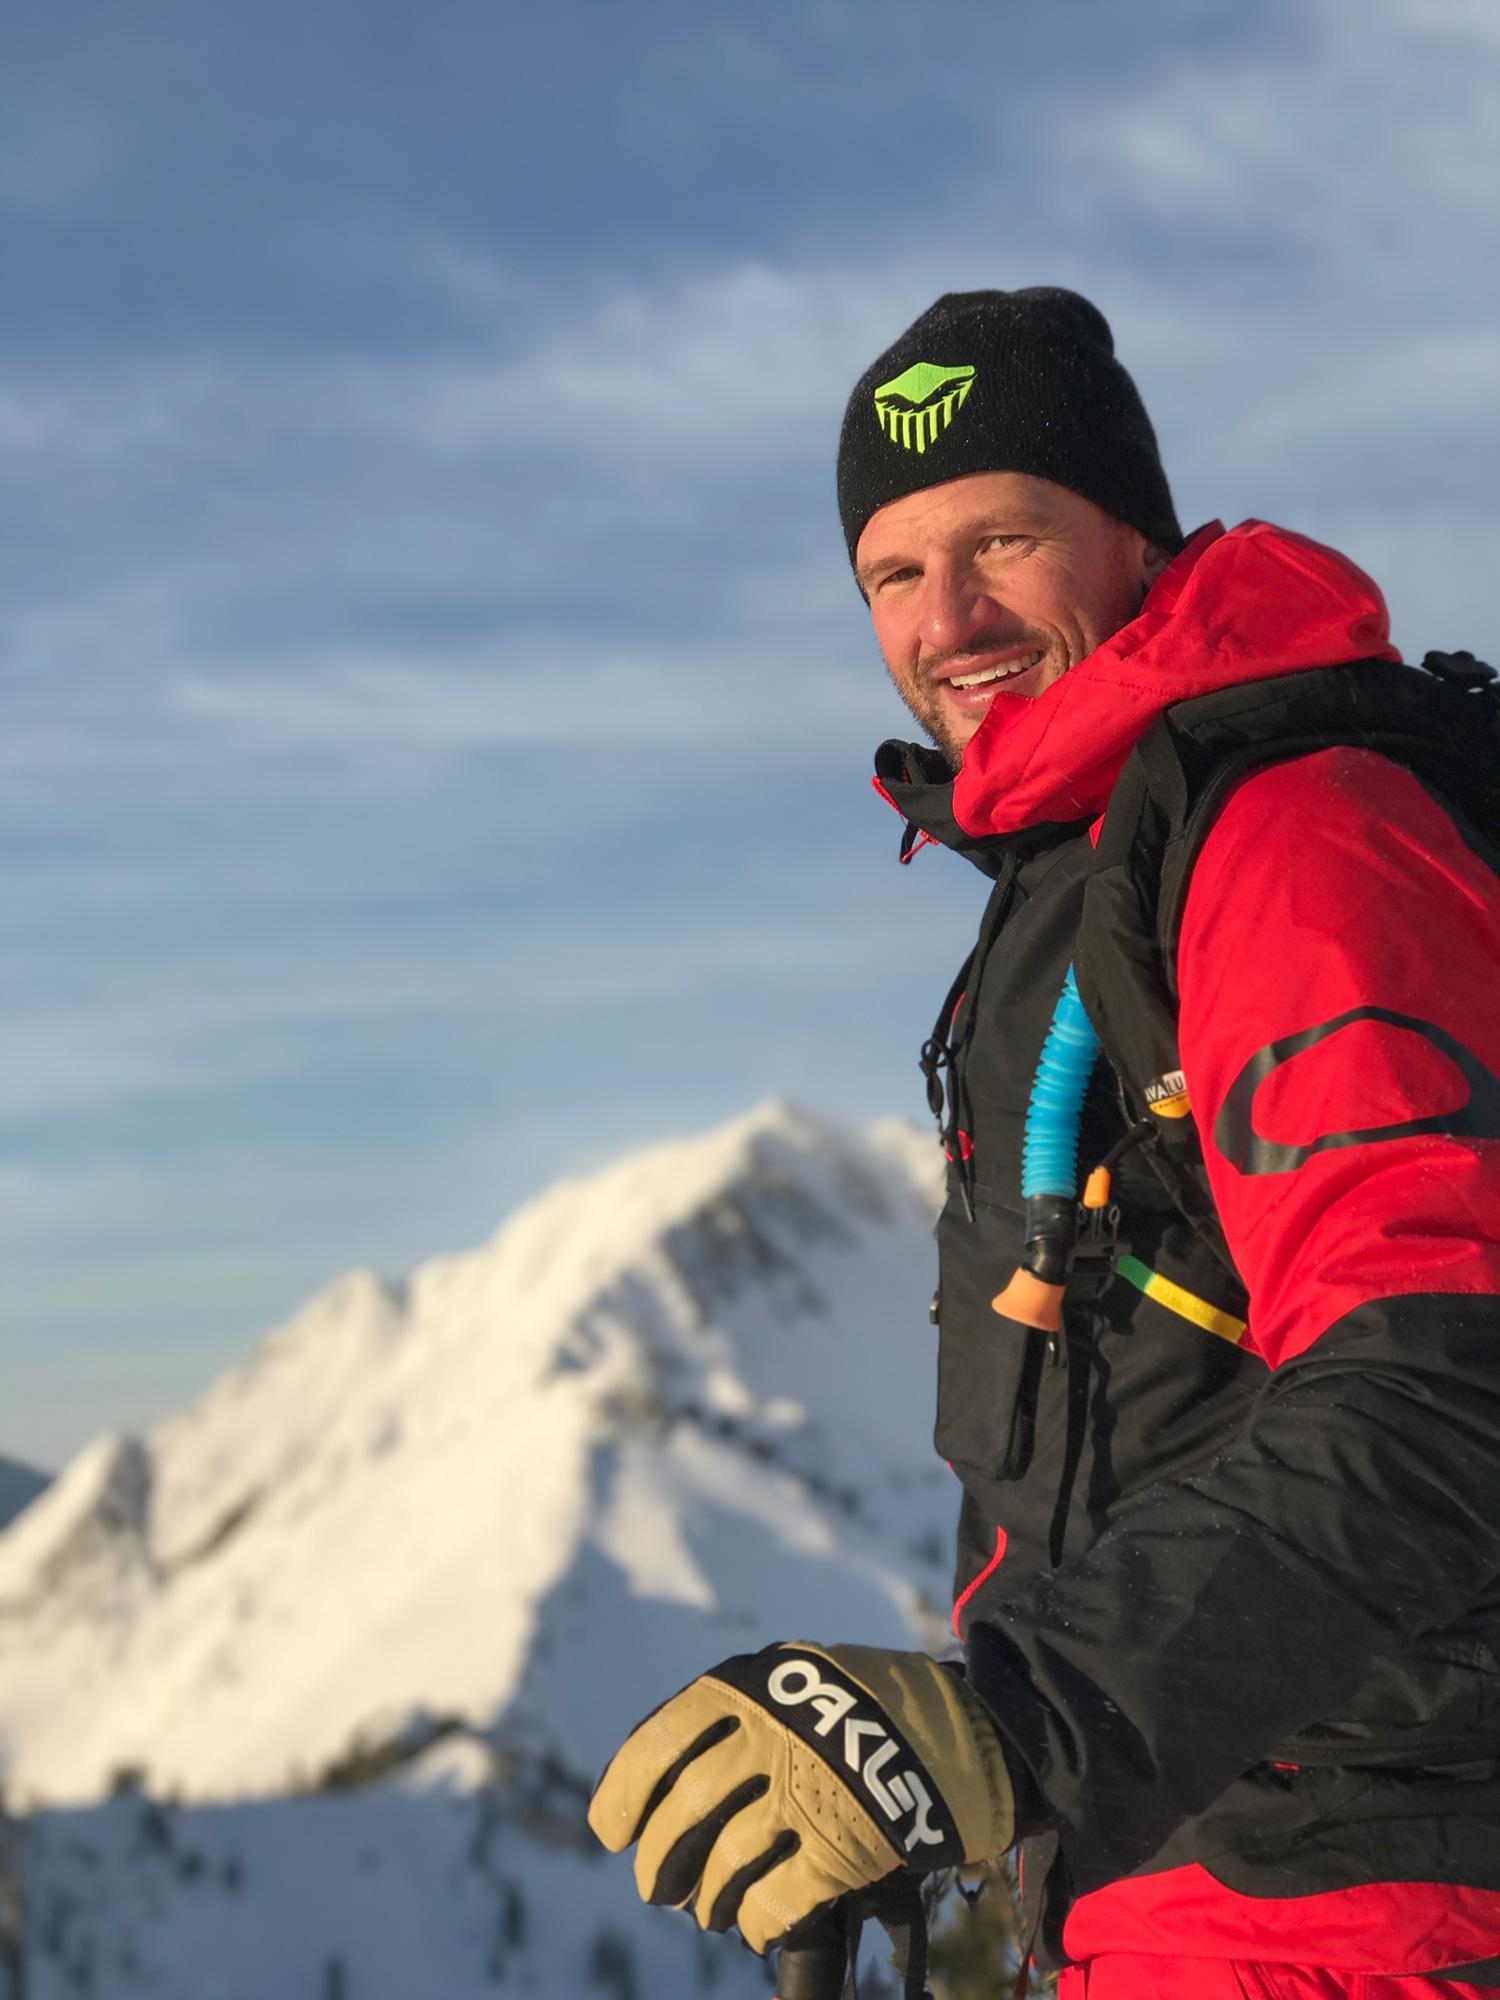 burke-alder-ski-summit-iphone-7-plus-portrait-mode.jpg